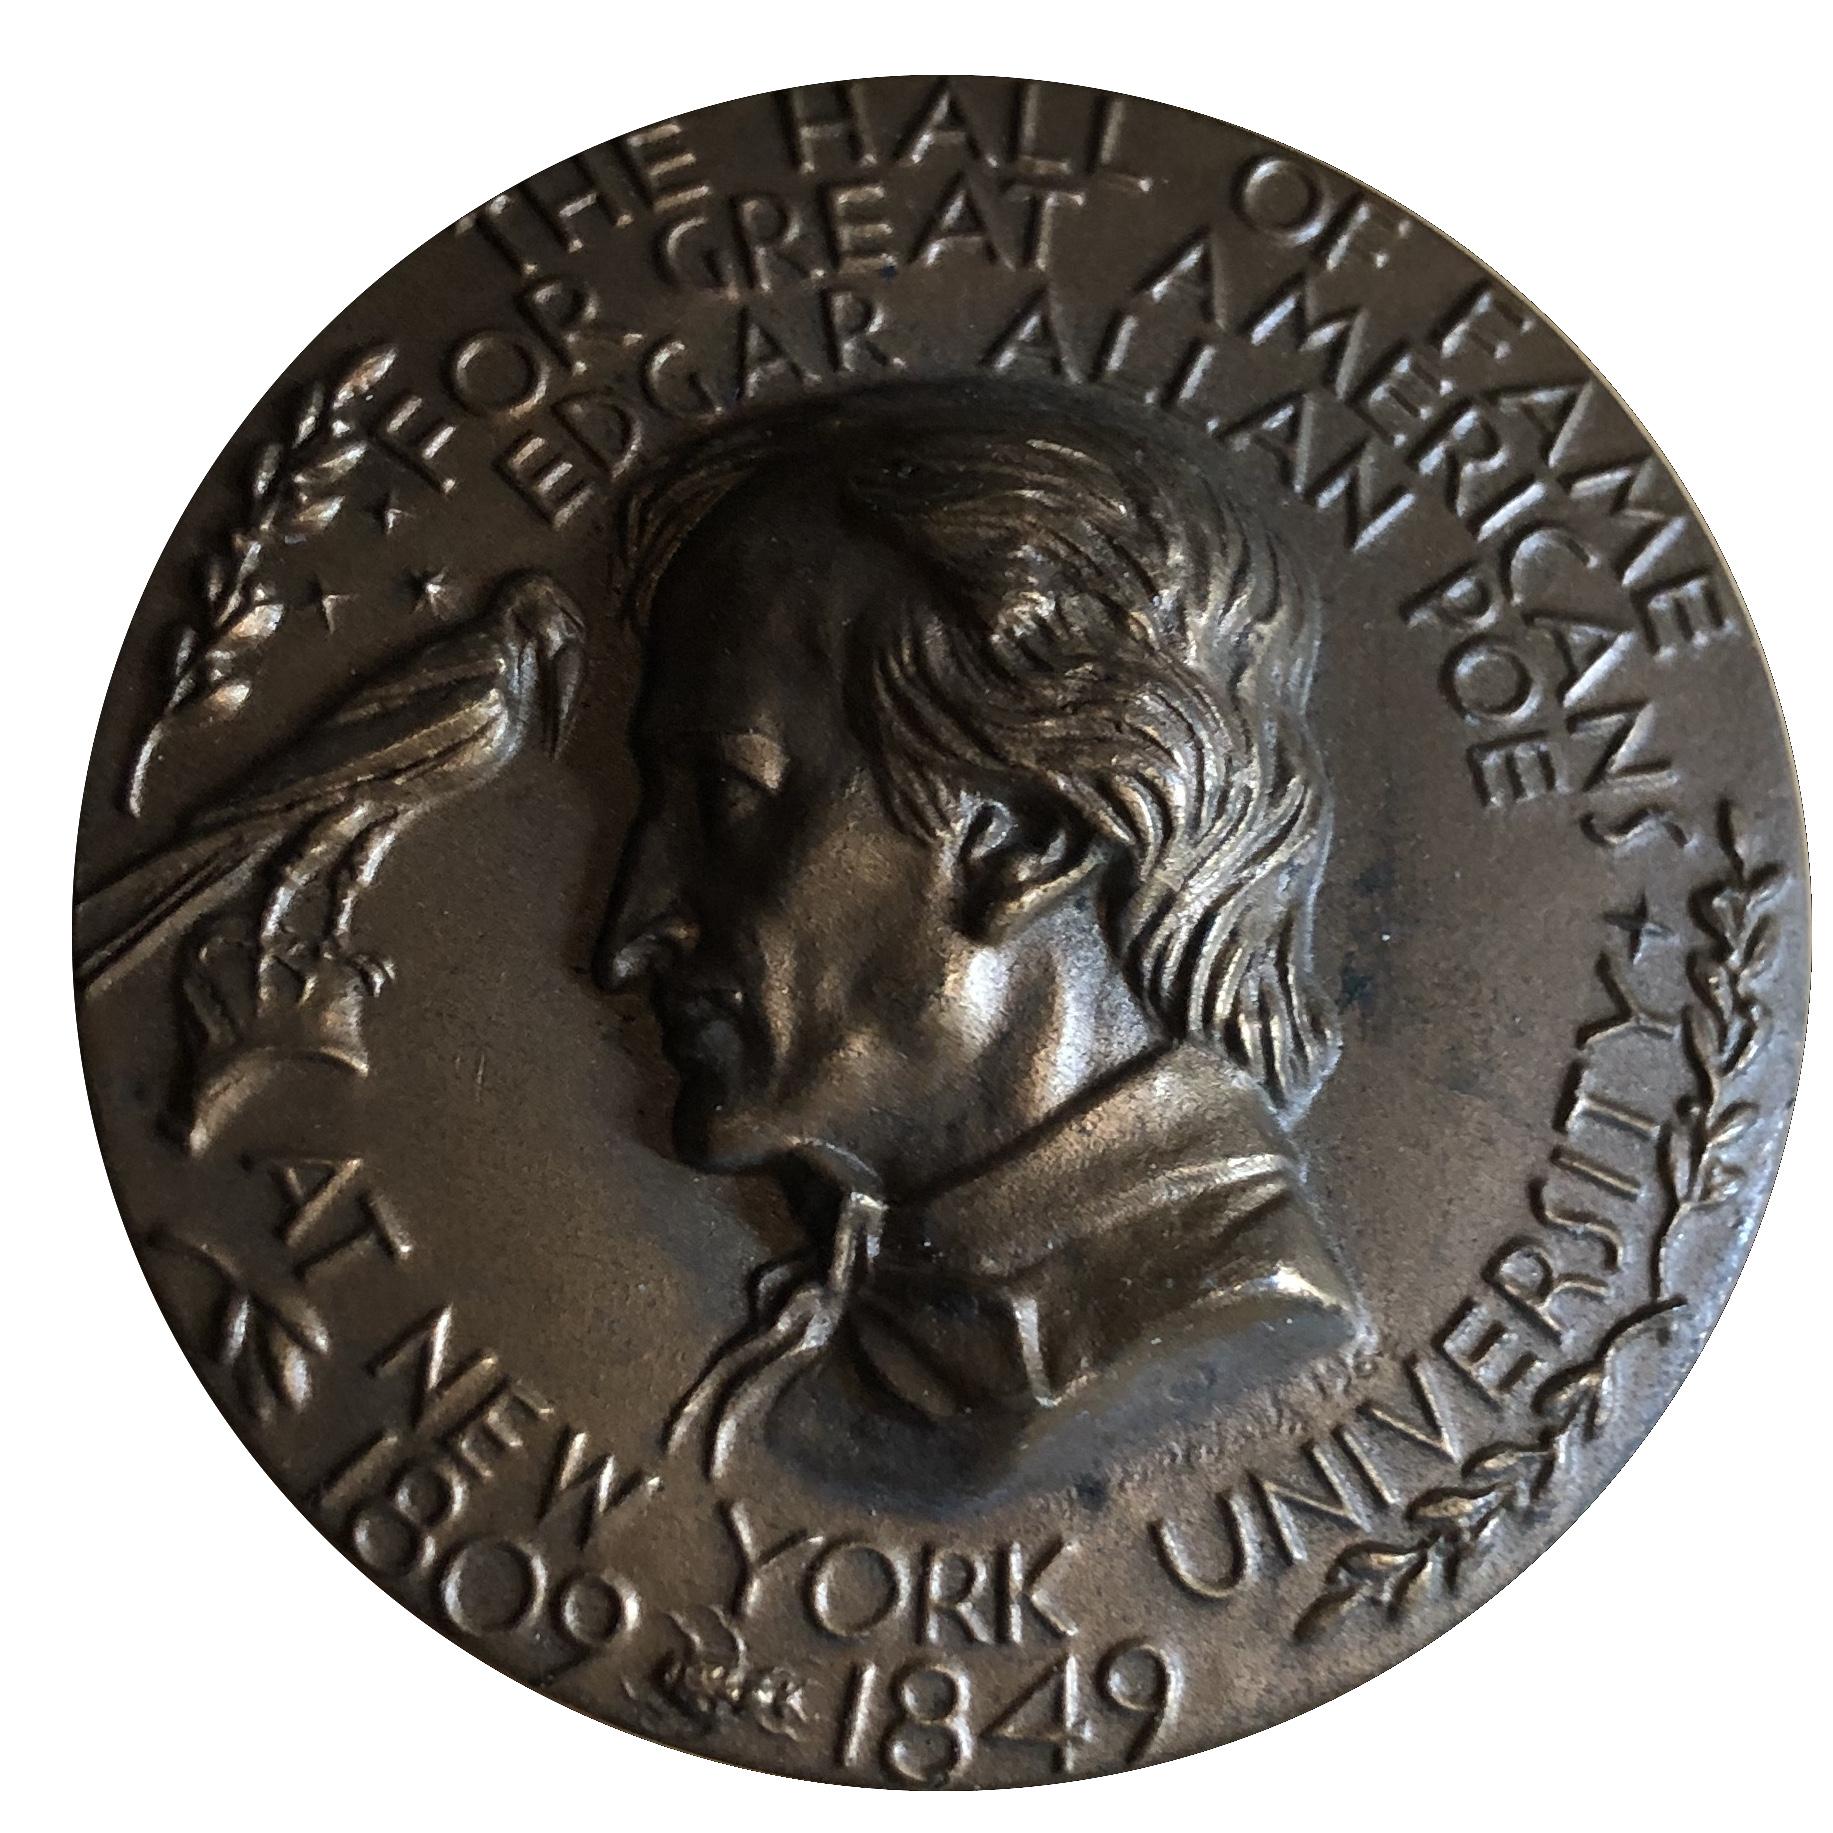 EDGAR ALLEN POE 1809-1849 /THE HALL OF FAME / NEW YORK